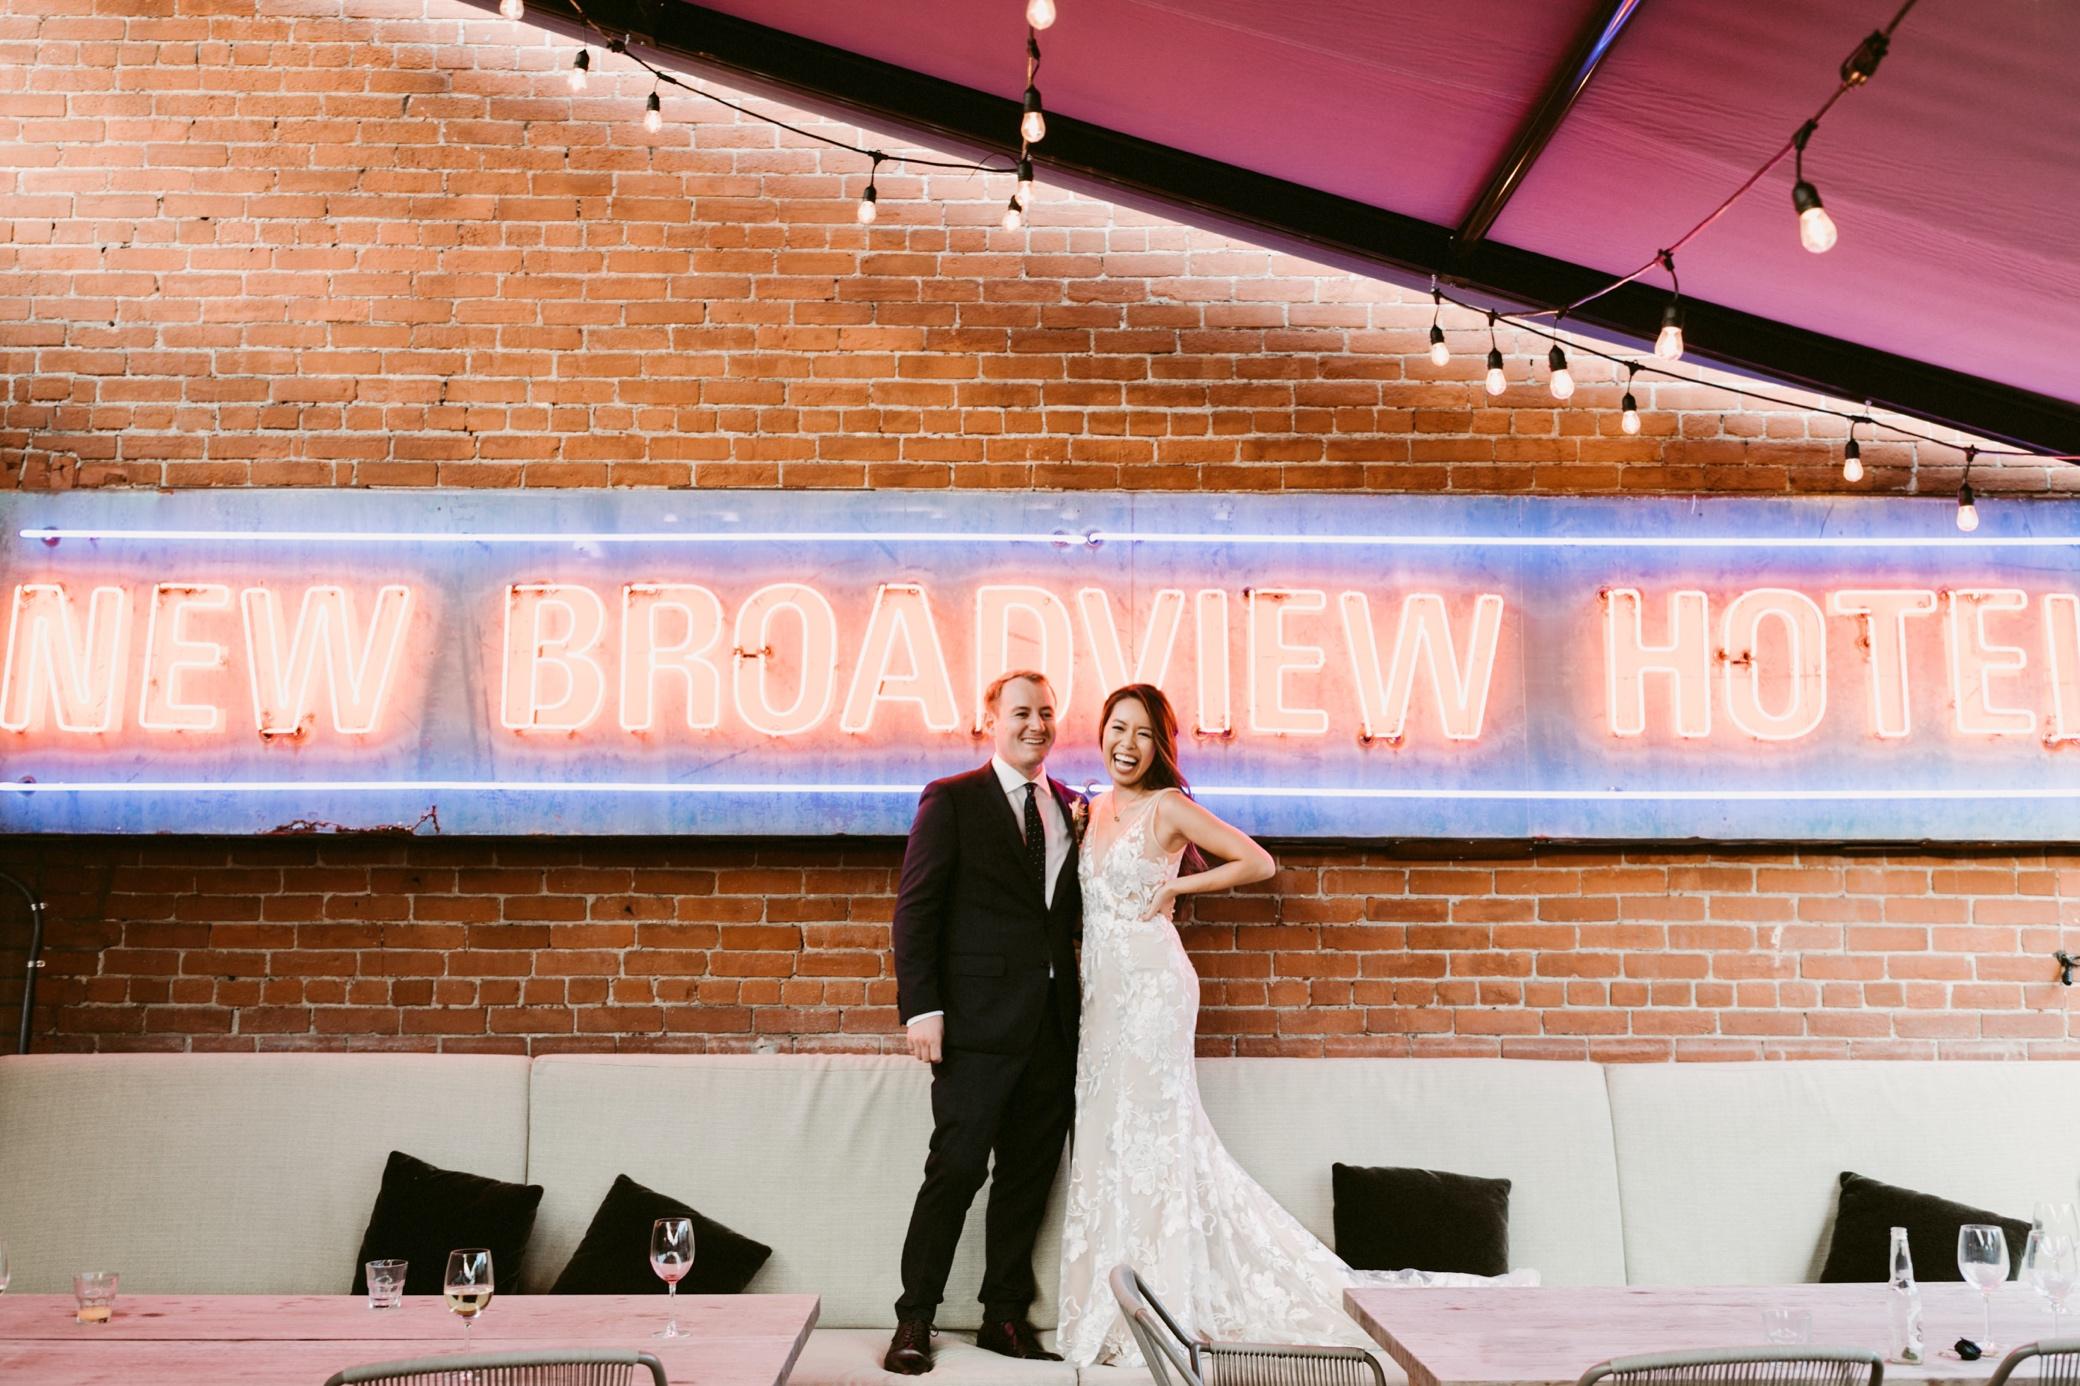 085_The Broadview Hotel Wedding (592 of 913).jpg